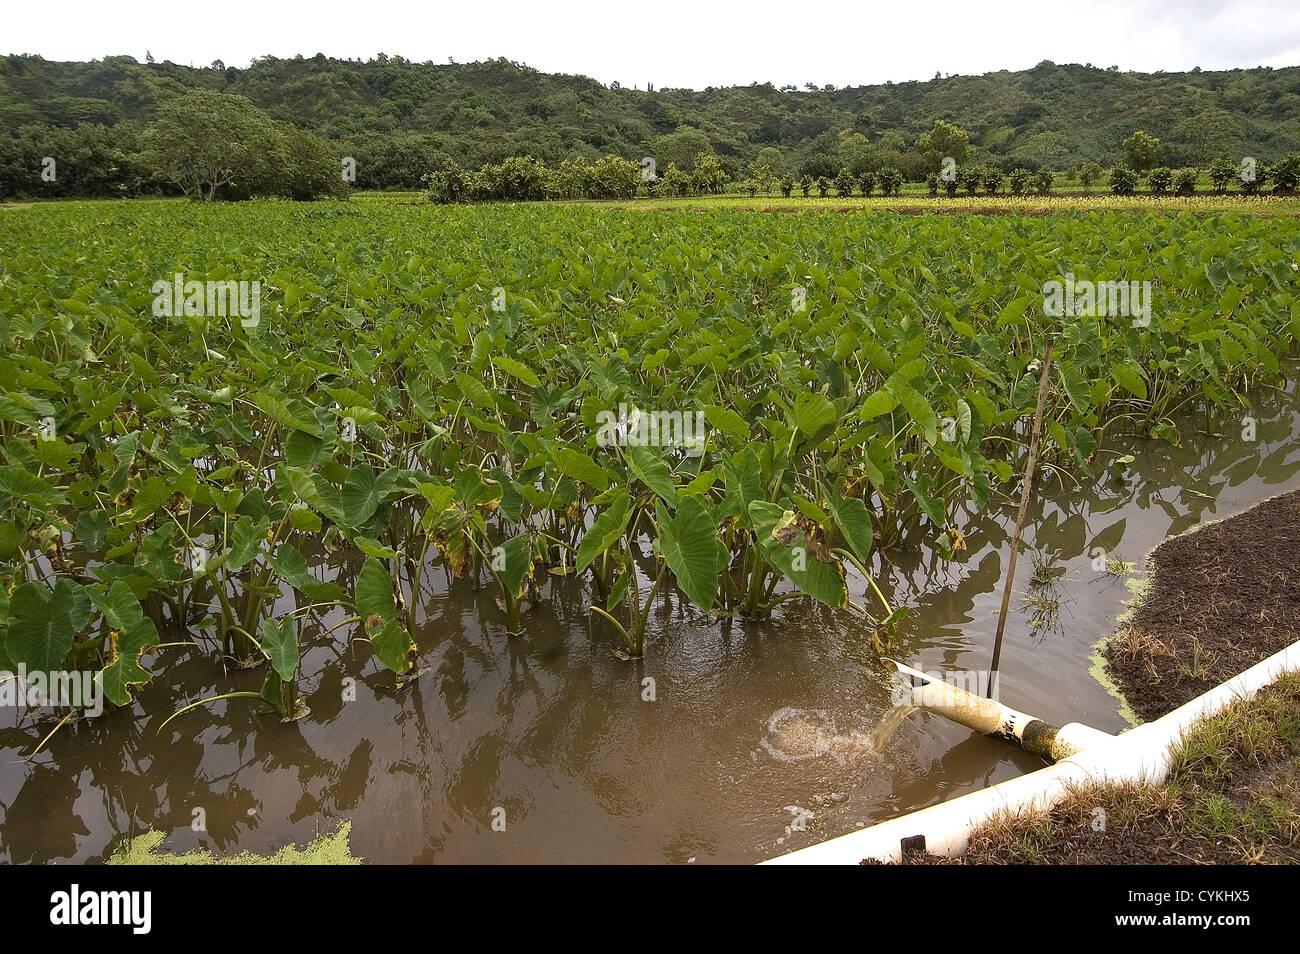 Elk284-7722 Hawaii, Kauai, taro field in Hanalei Valley, irrigation system - Stock Image